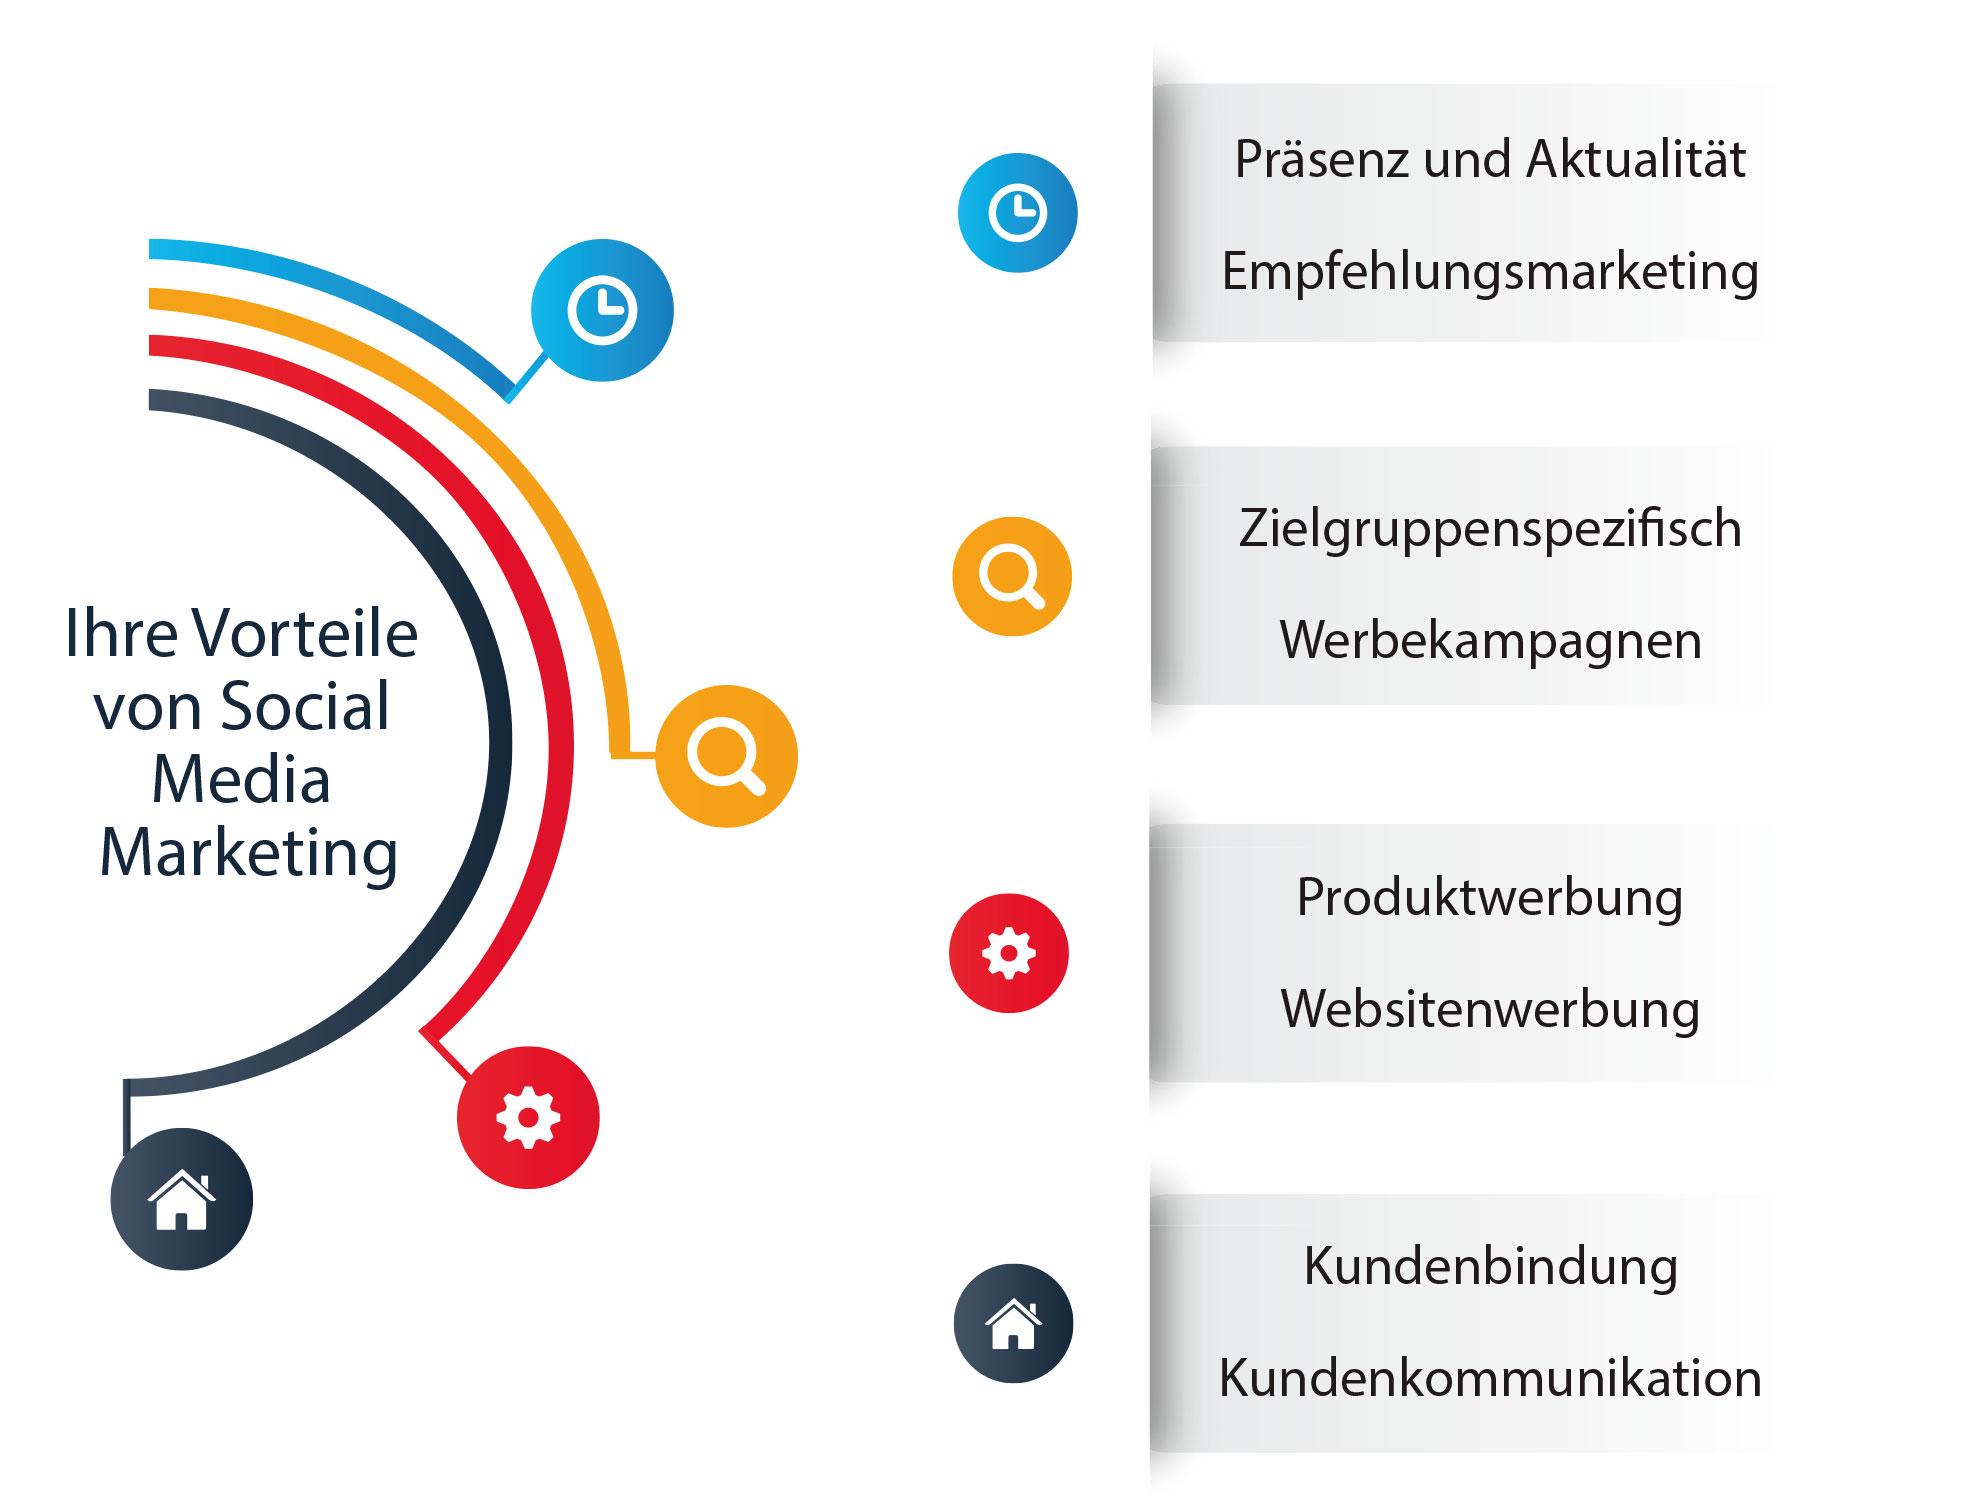 Muenswebit Social Media Marketing Vorteile Infografik